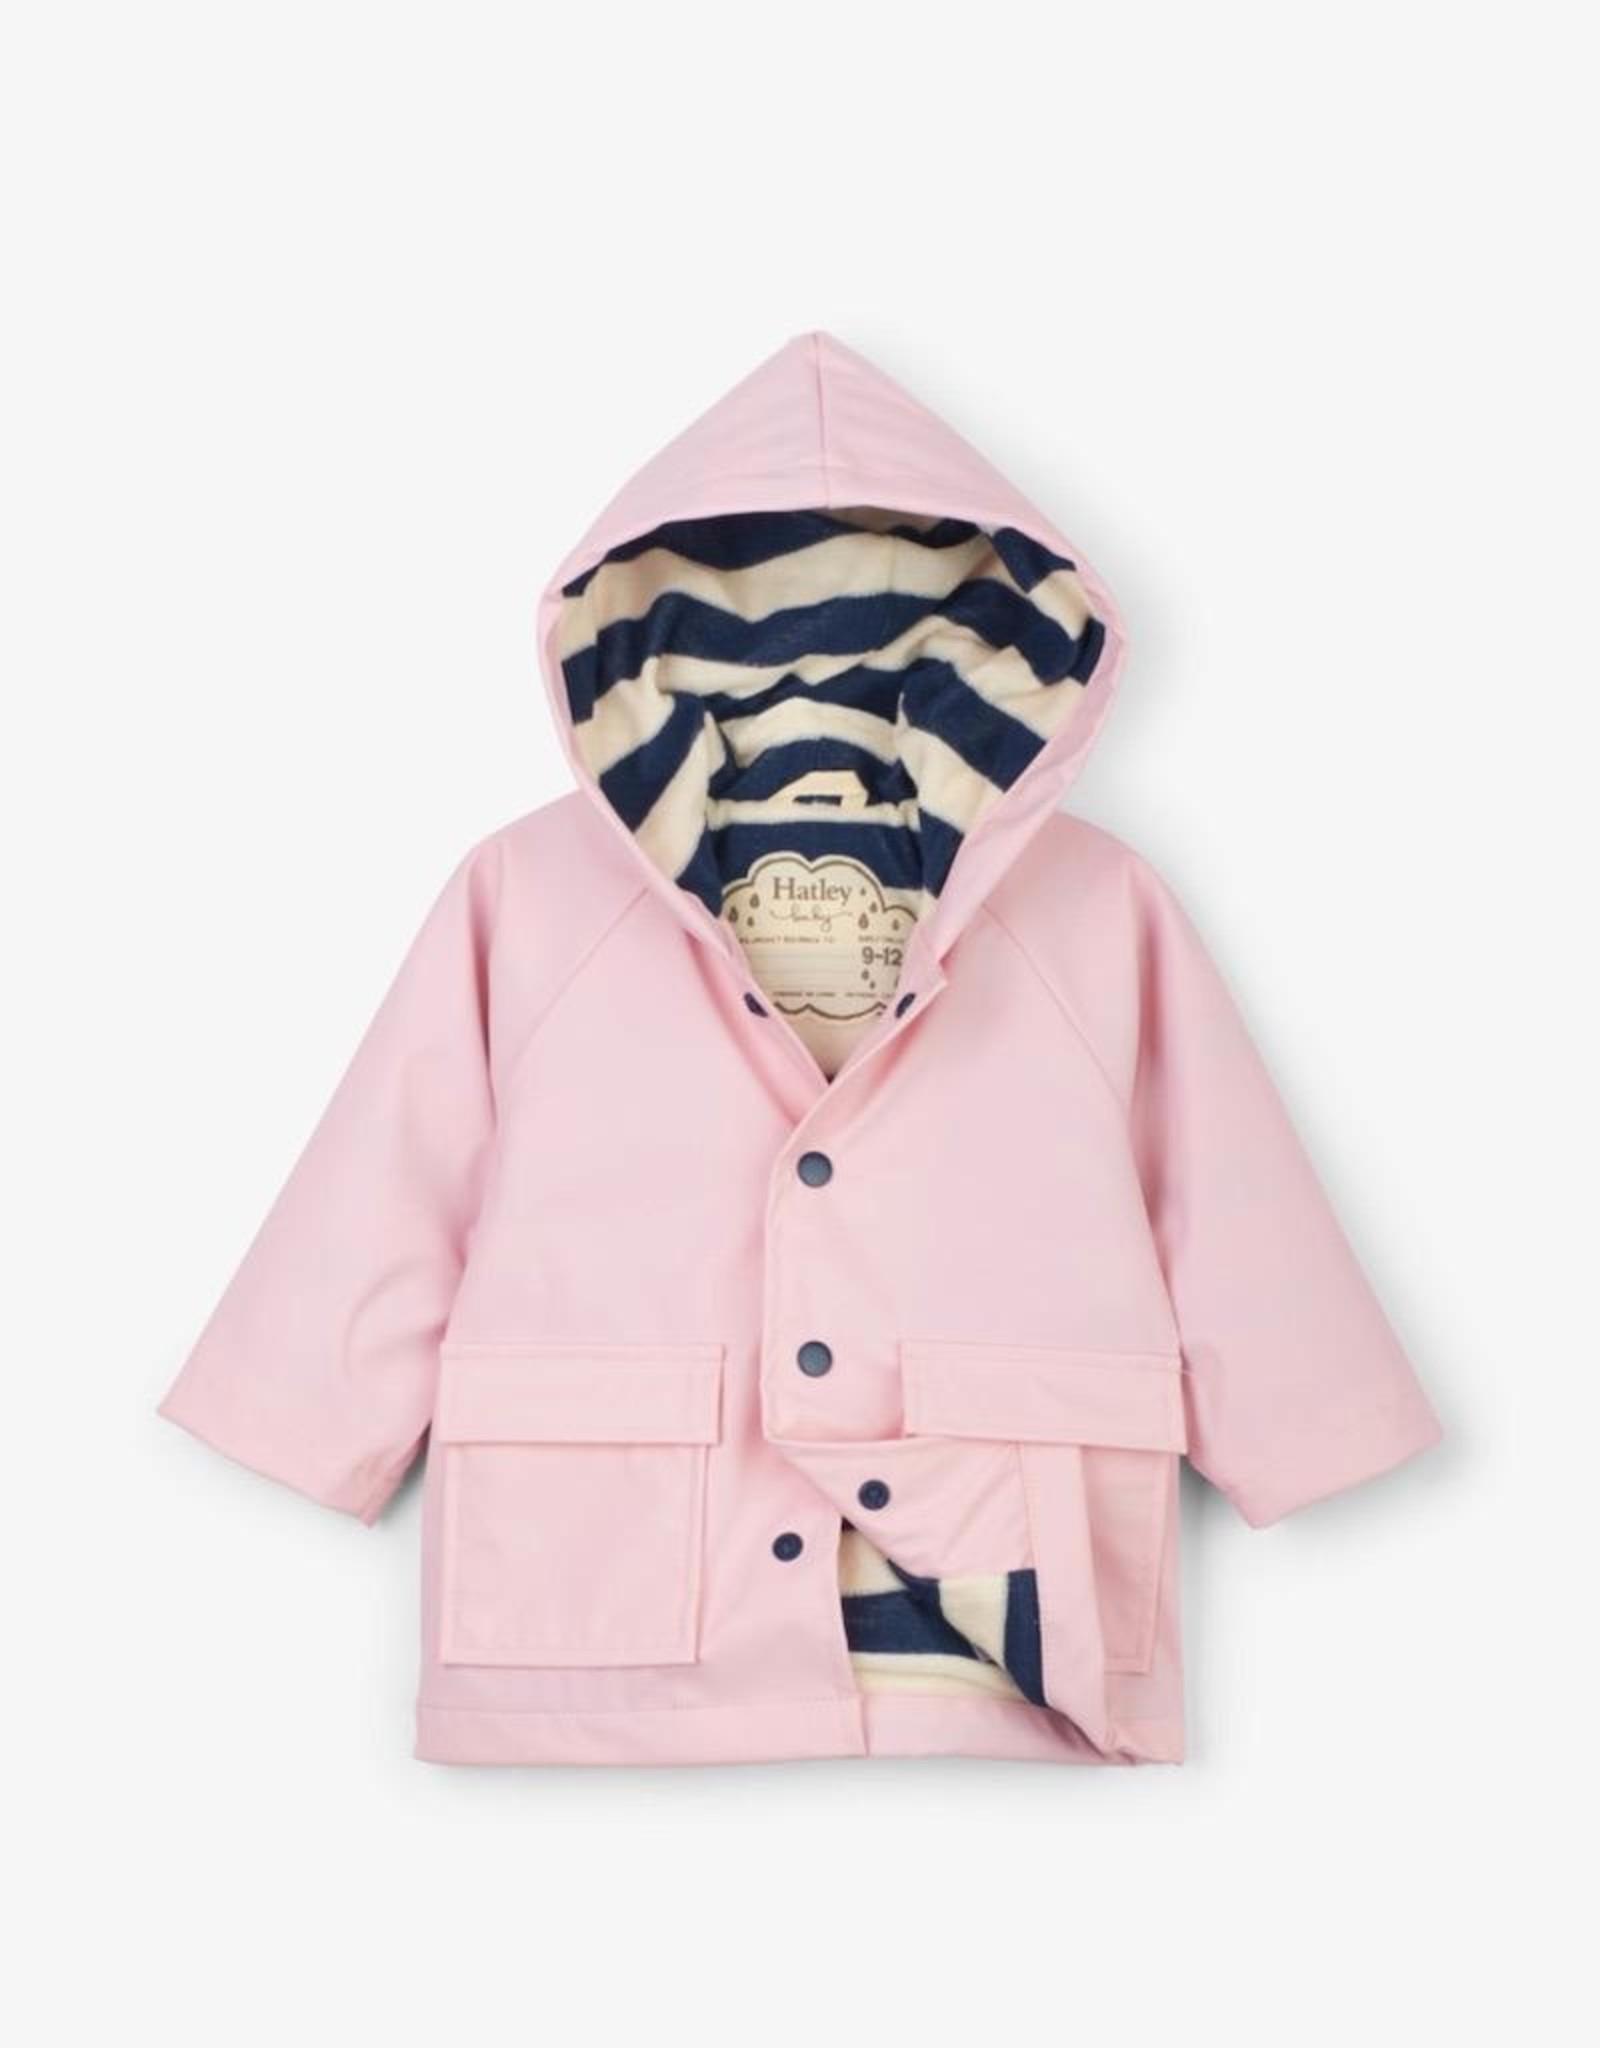 Hatley Pink Baby Raincoat